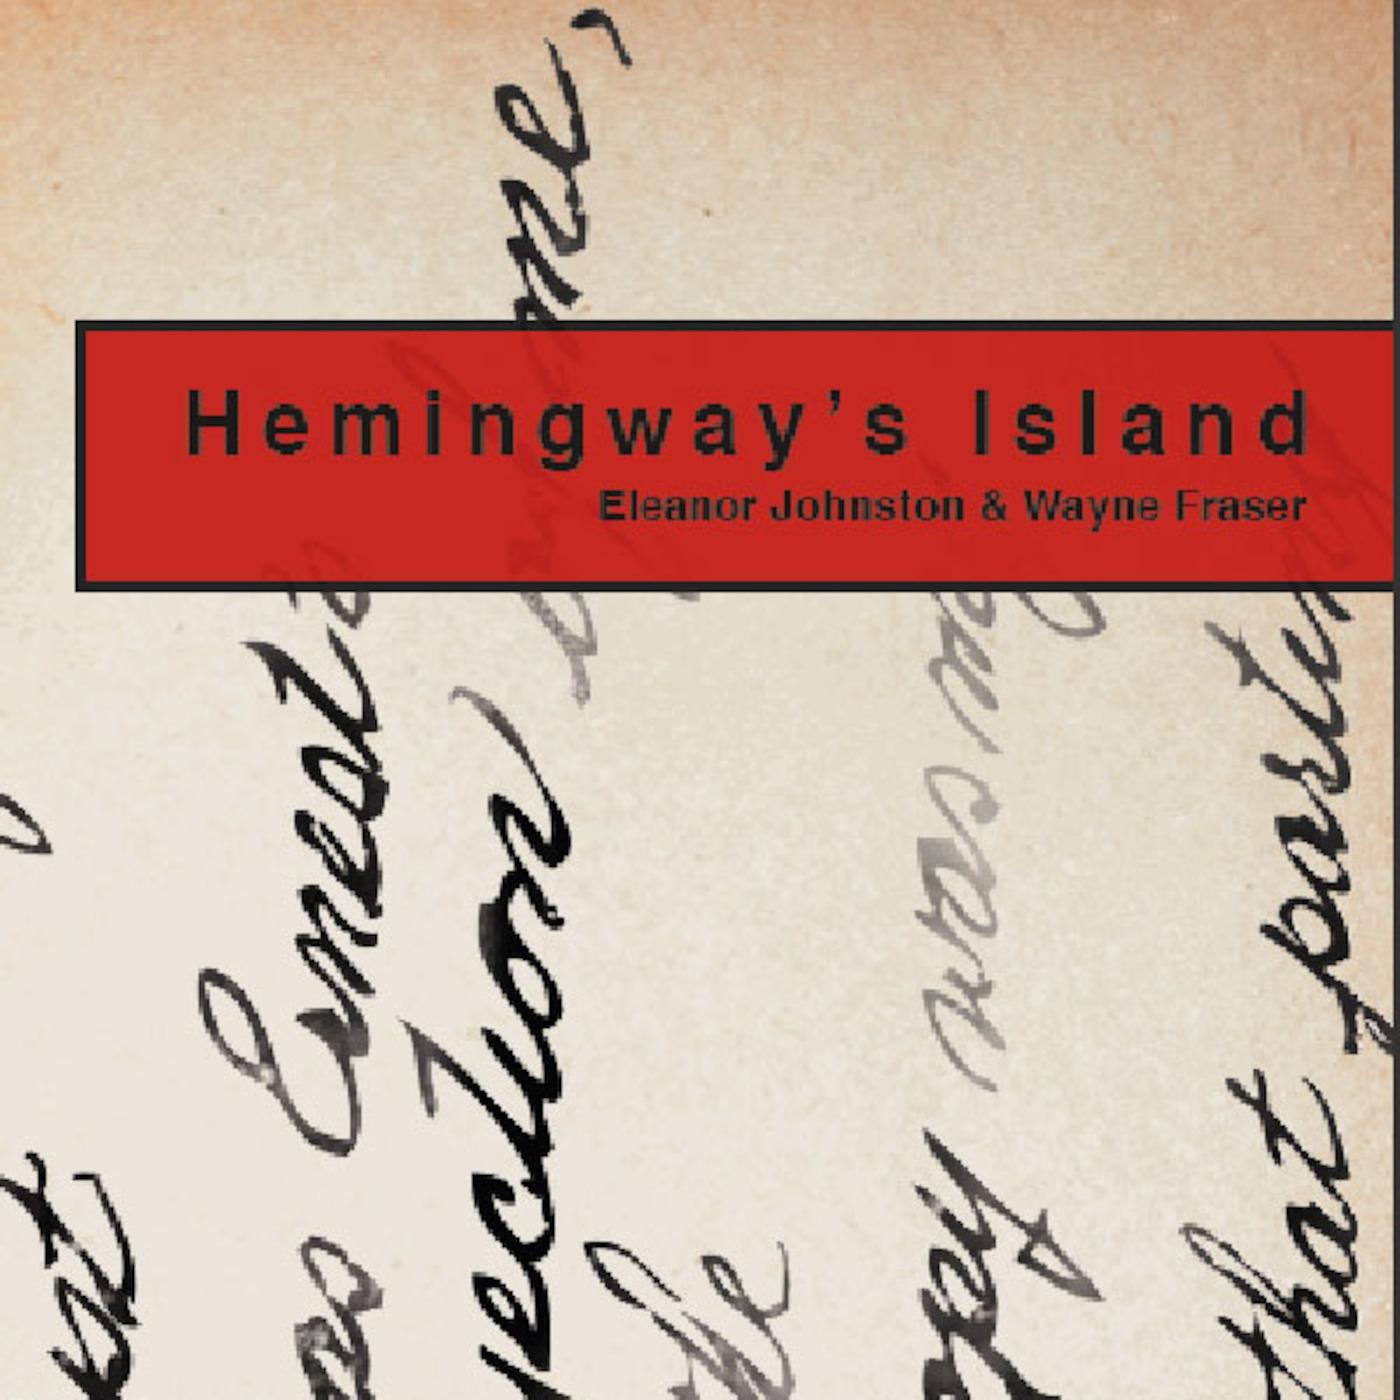 Hemingway's Island: the Podcast